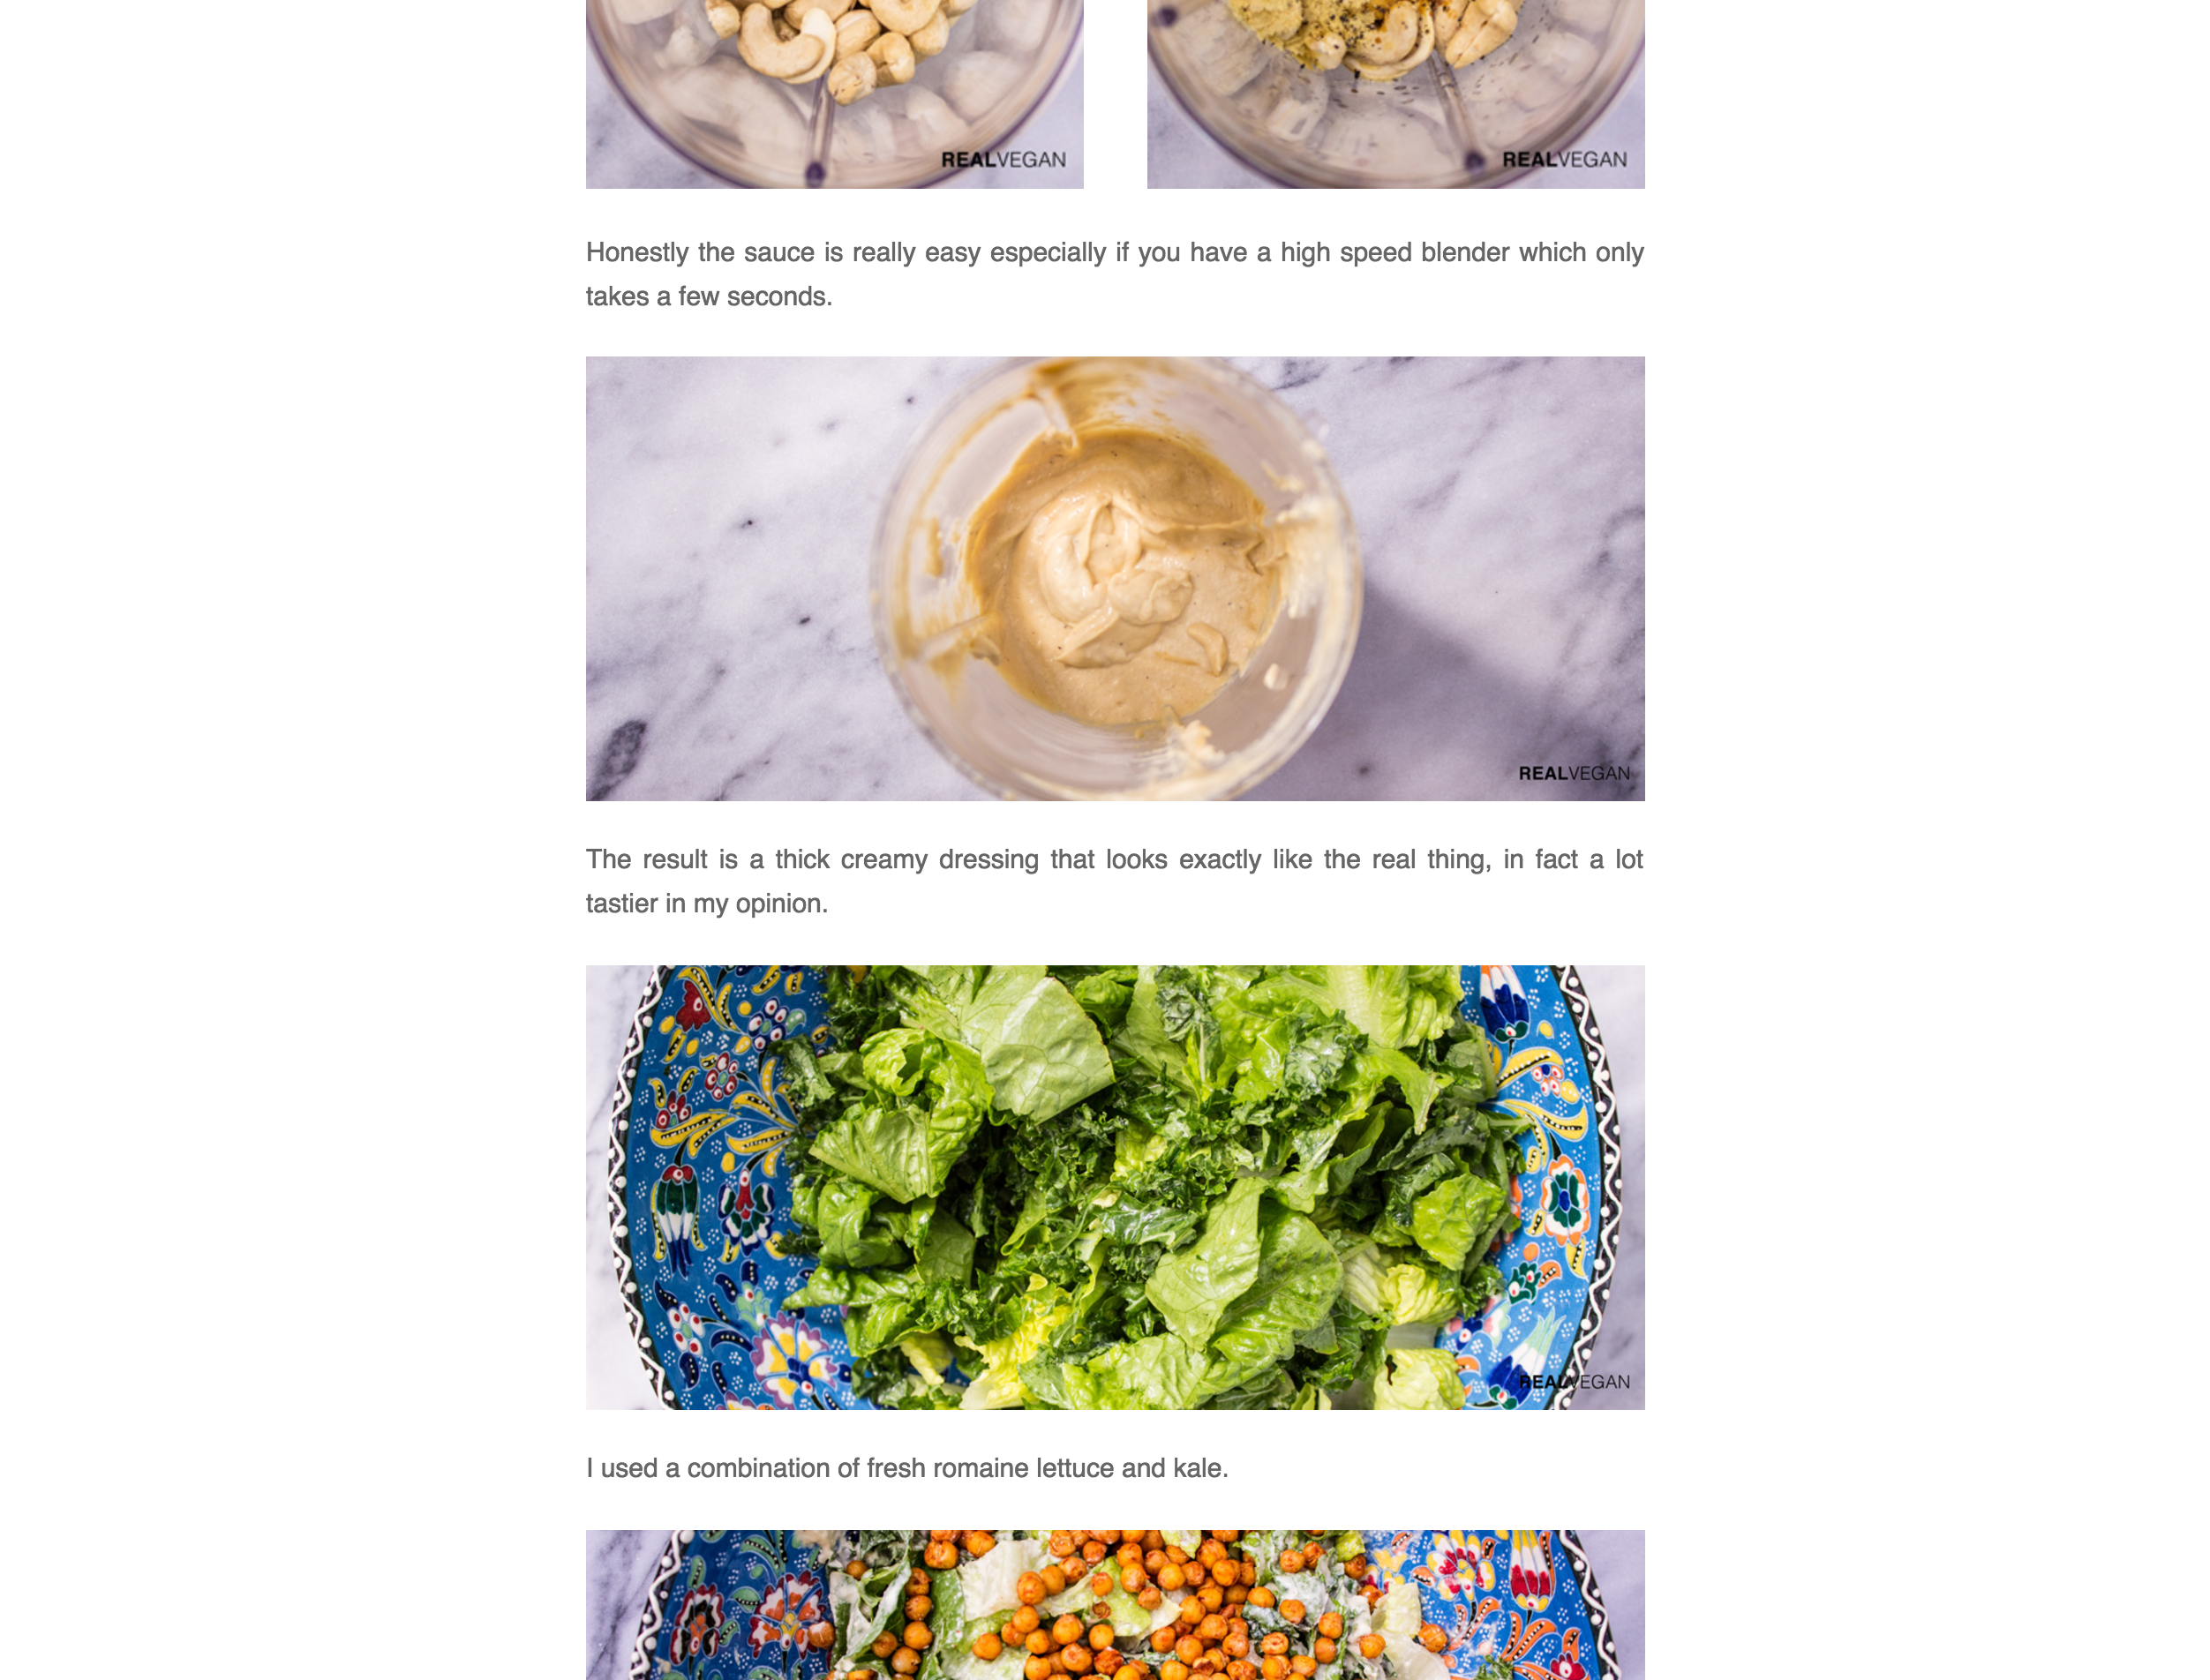 A screenshot of a recipe from realvegan.co.uk